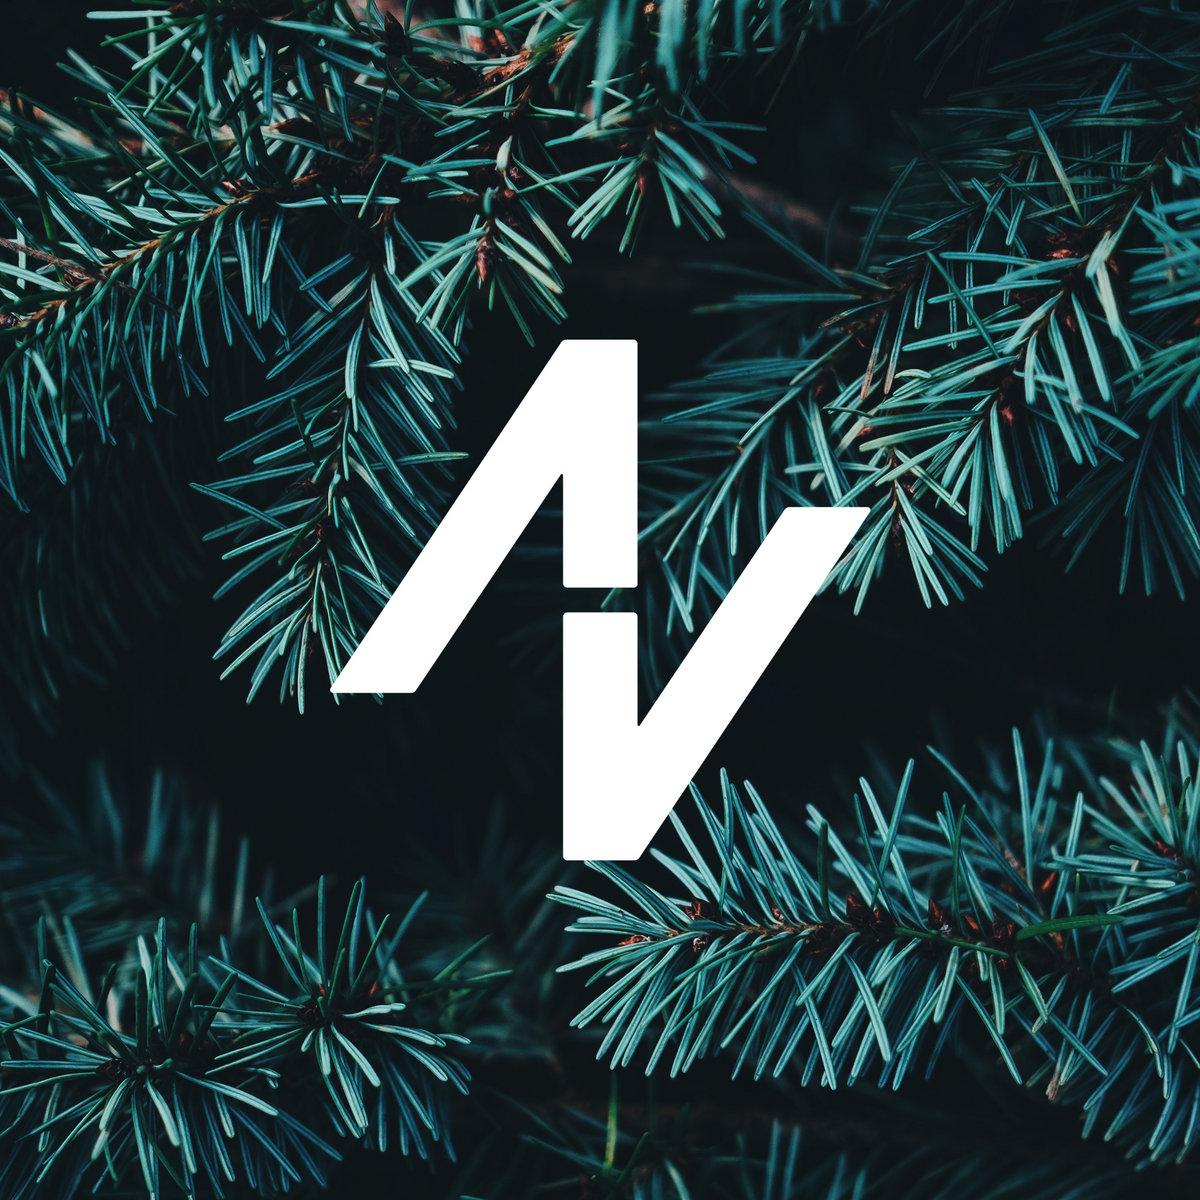 Christmas Remix.Christmas Remix God Rest Ye Merry Gentlemen Approaching